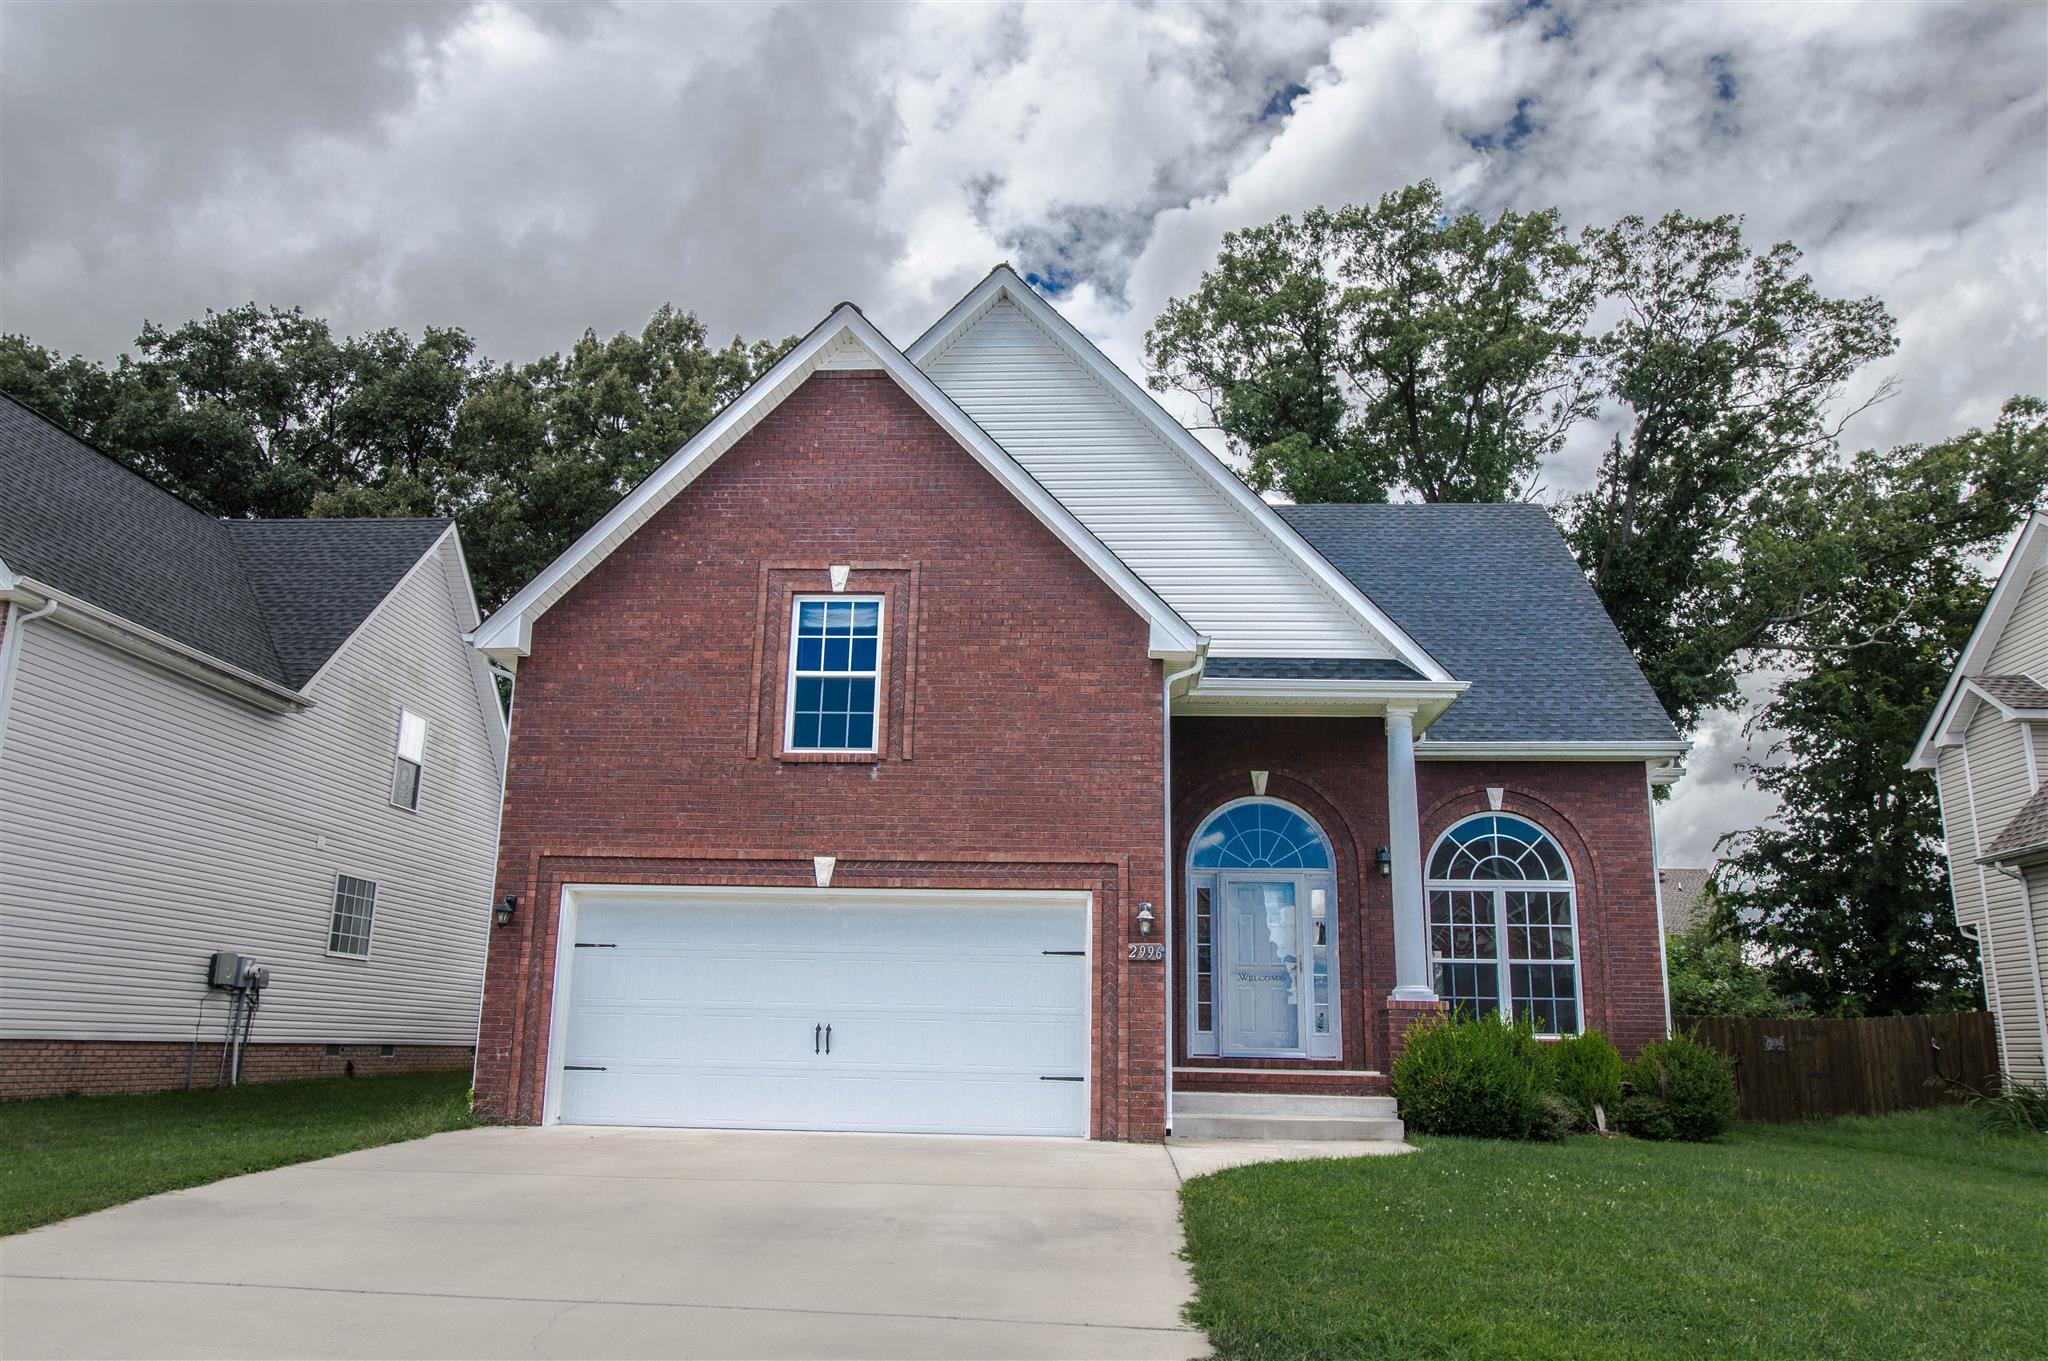 2996 Brewster Dr, Clarksville, TN 37040 - Clarksville, TN real estate listing